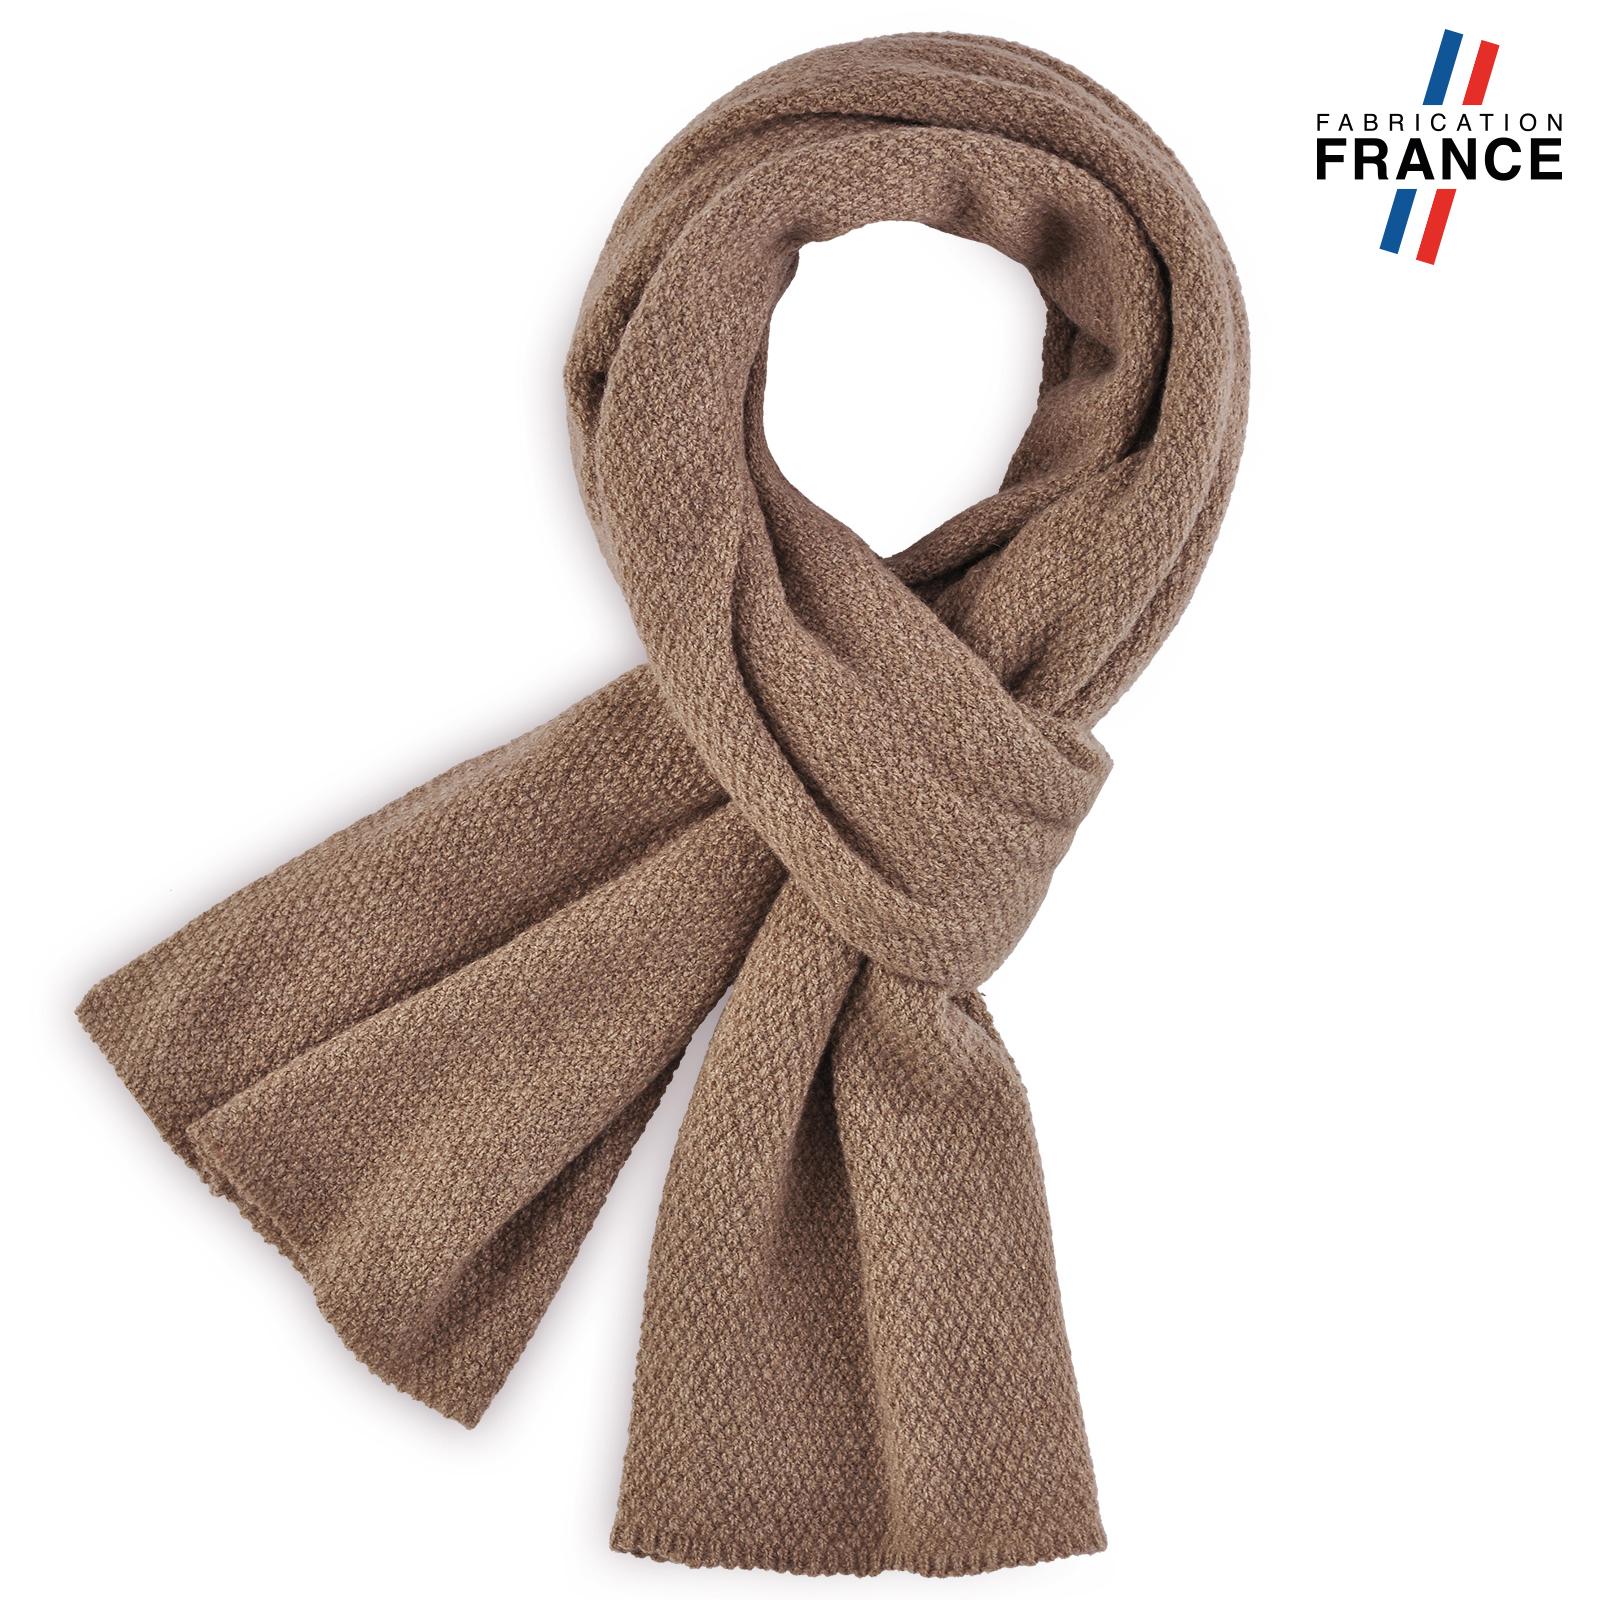 AT-03186-F16-echarpe-laine-cachemire-taupe-uni-fabrication-francaise